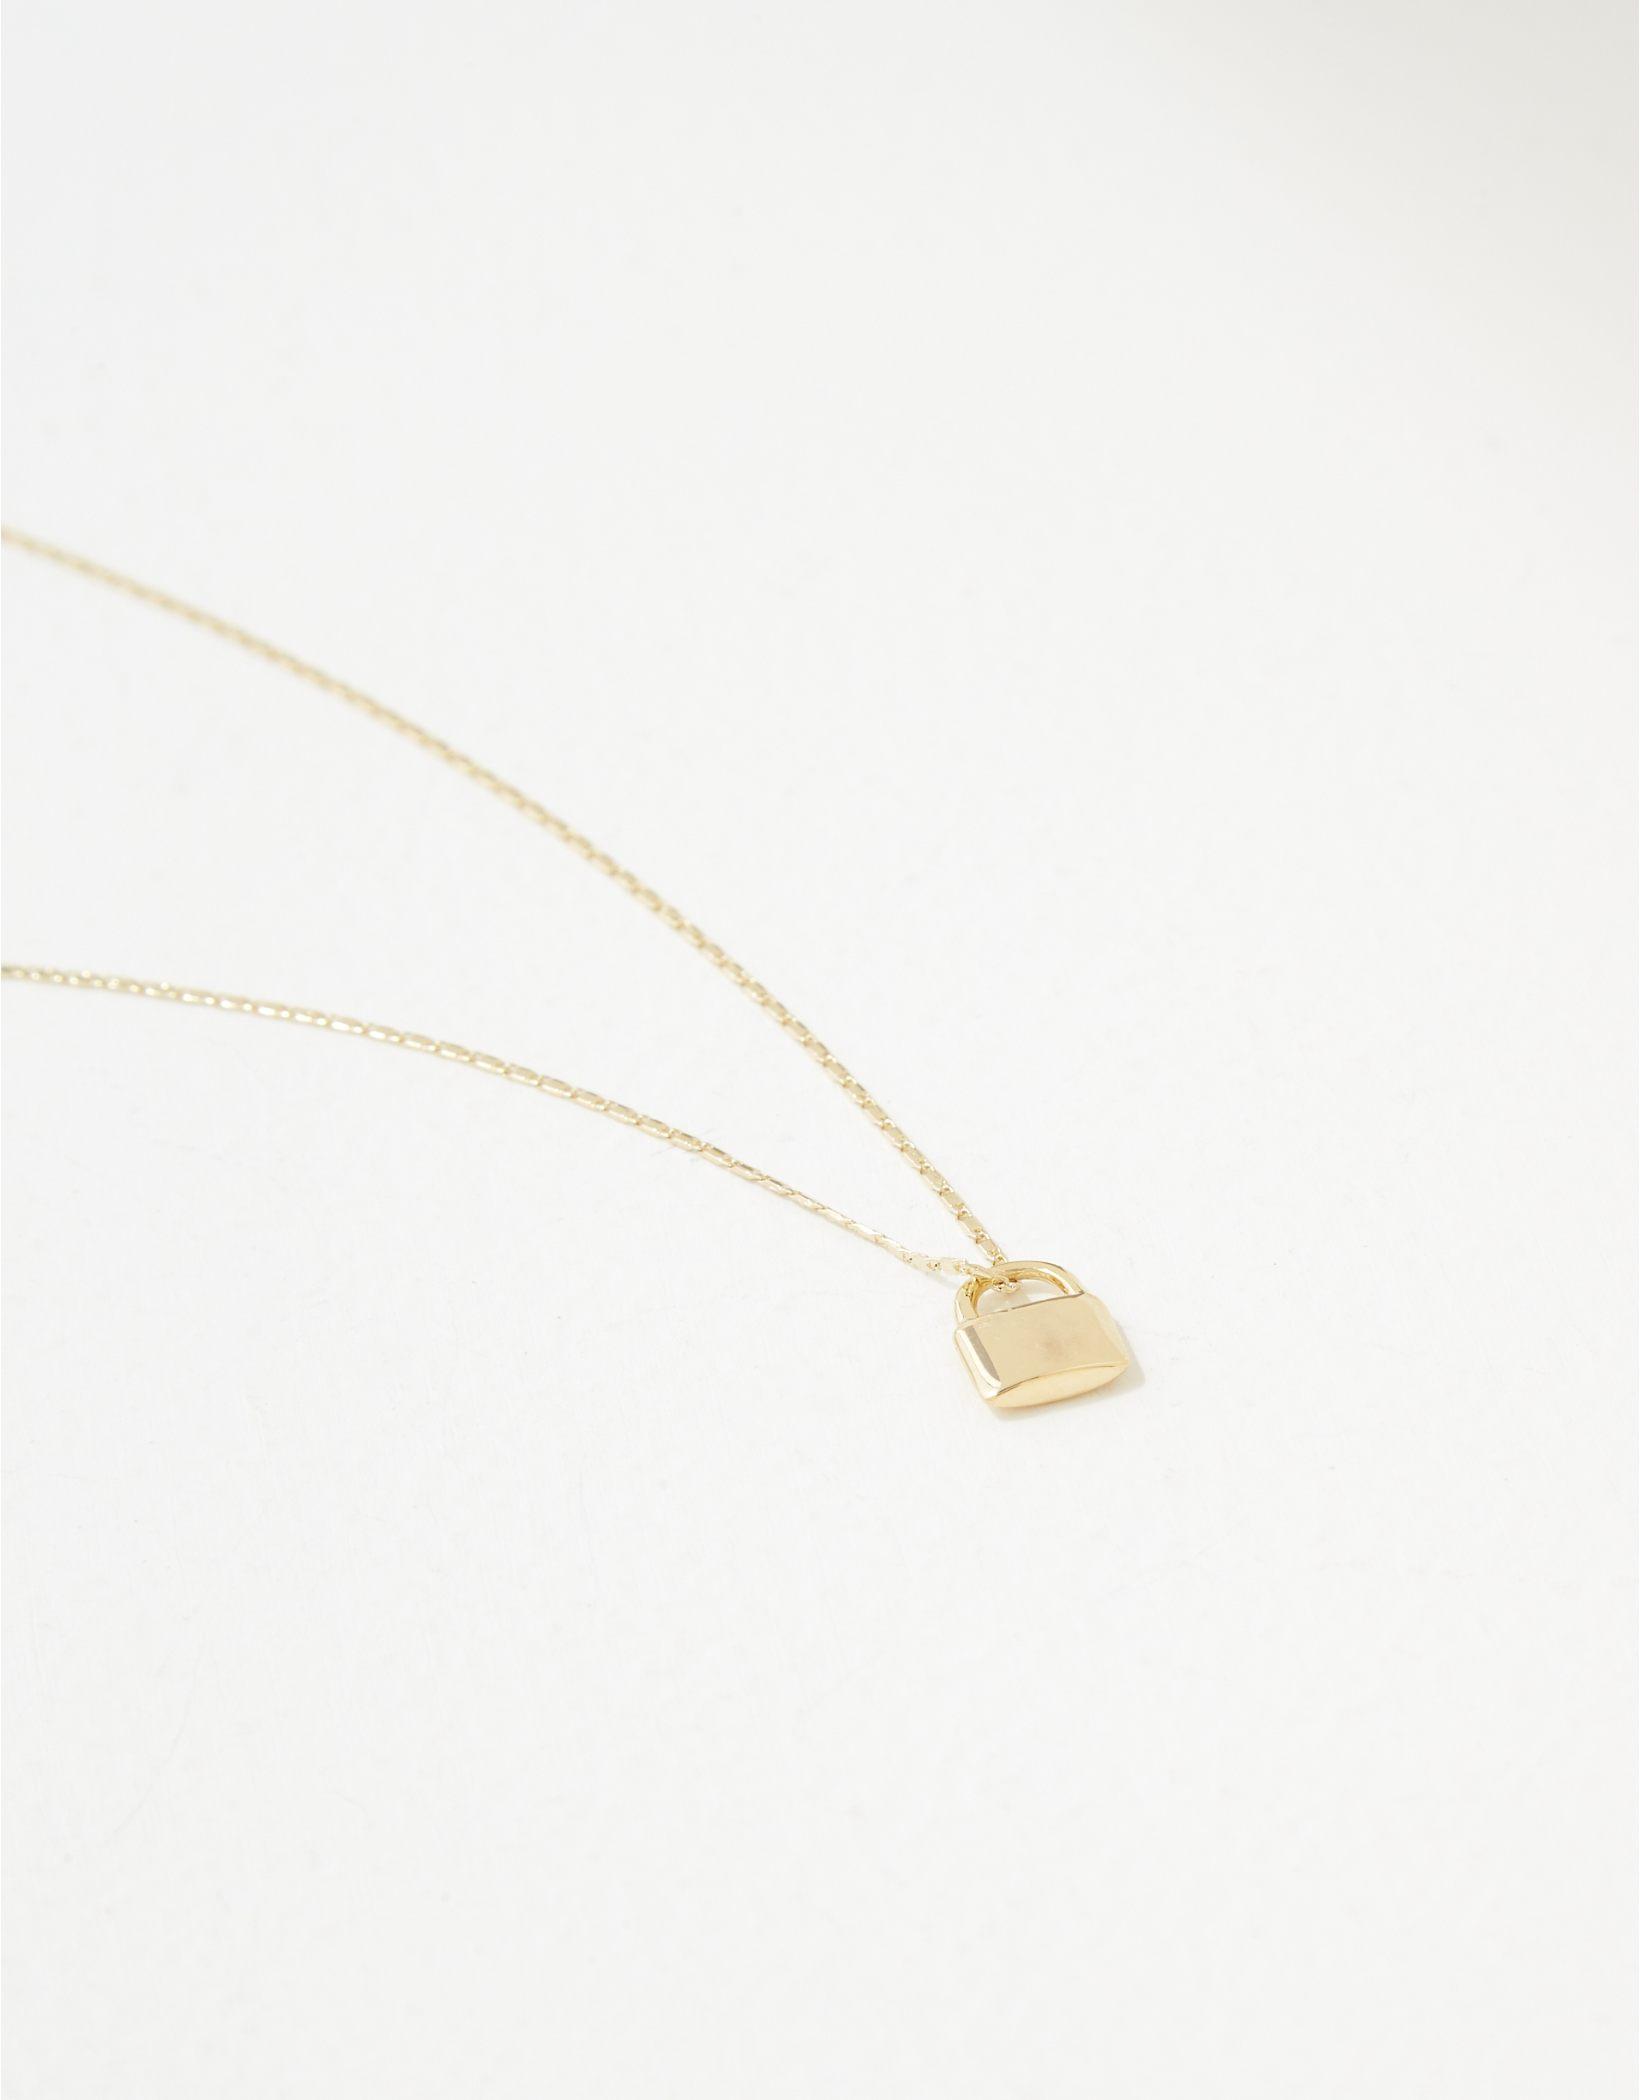 AE Demi-Fine 14K Gold Locket Necklace